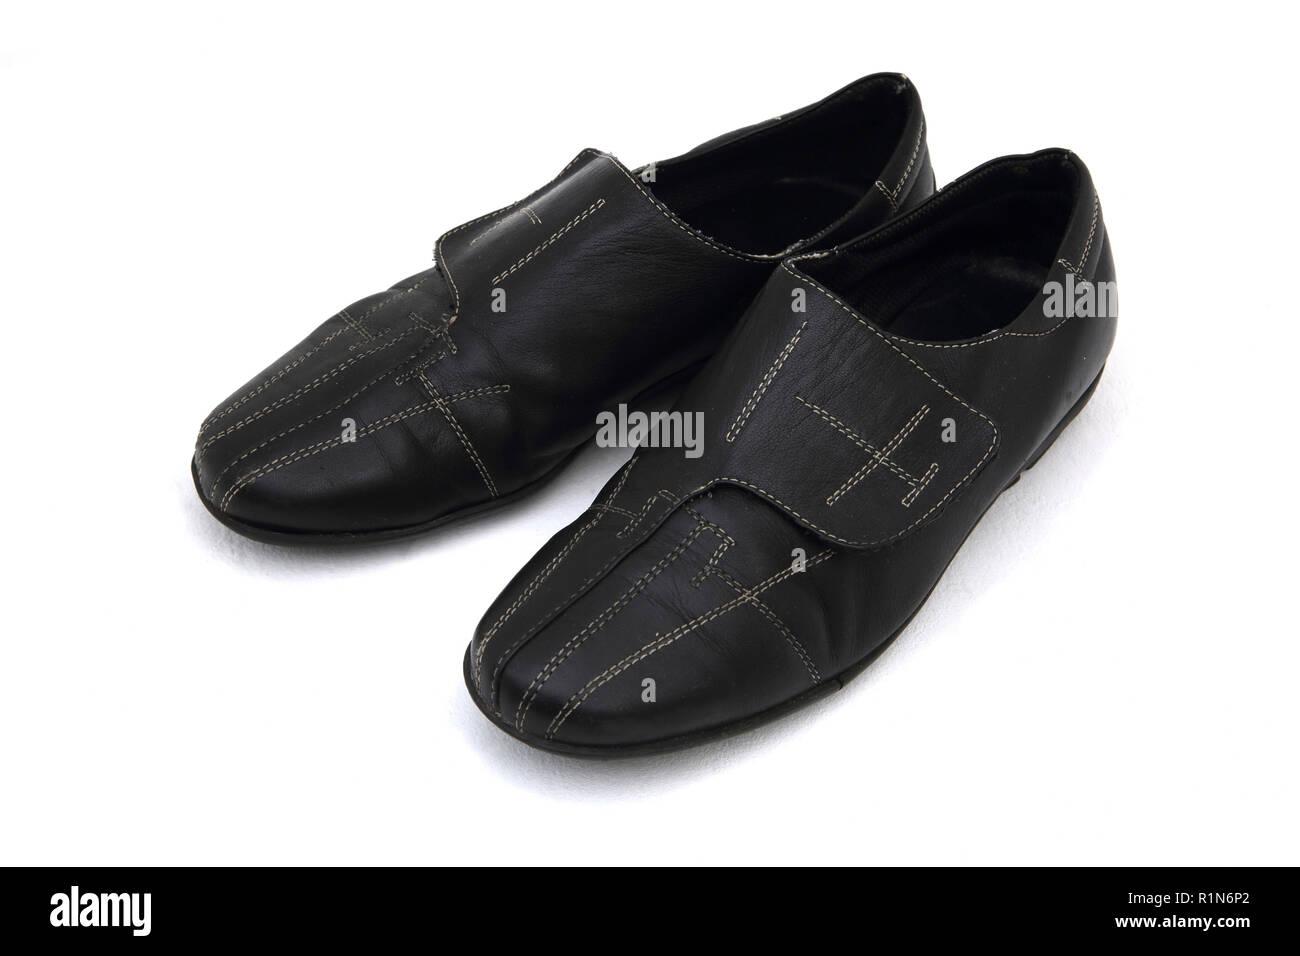 size 40 b0bb4 9ad72 Schwarze Flache Schuhe Stockfotos & Schwarze Flache Schuhe ...